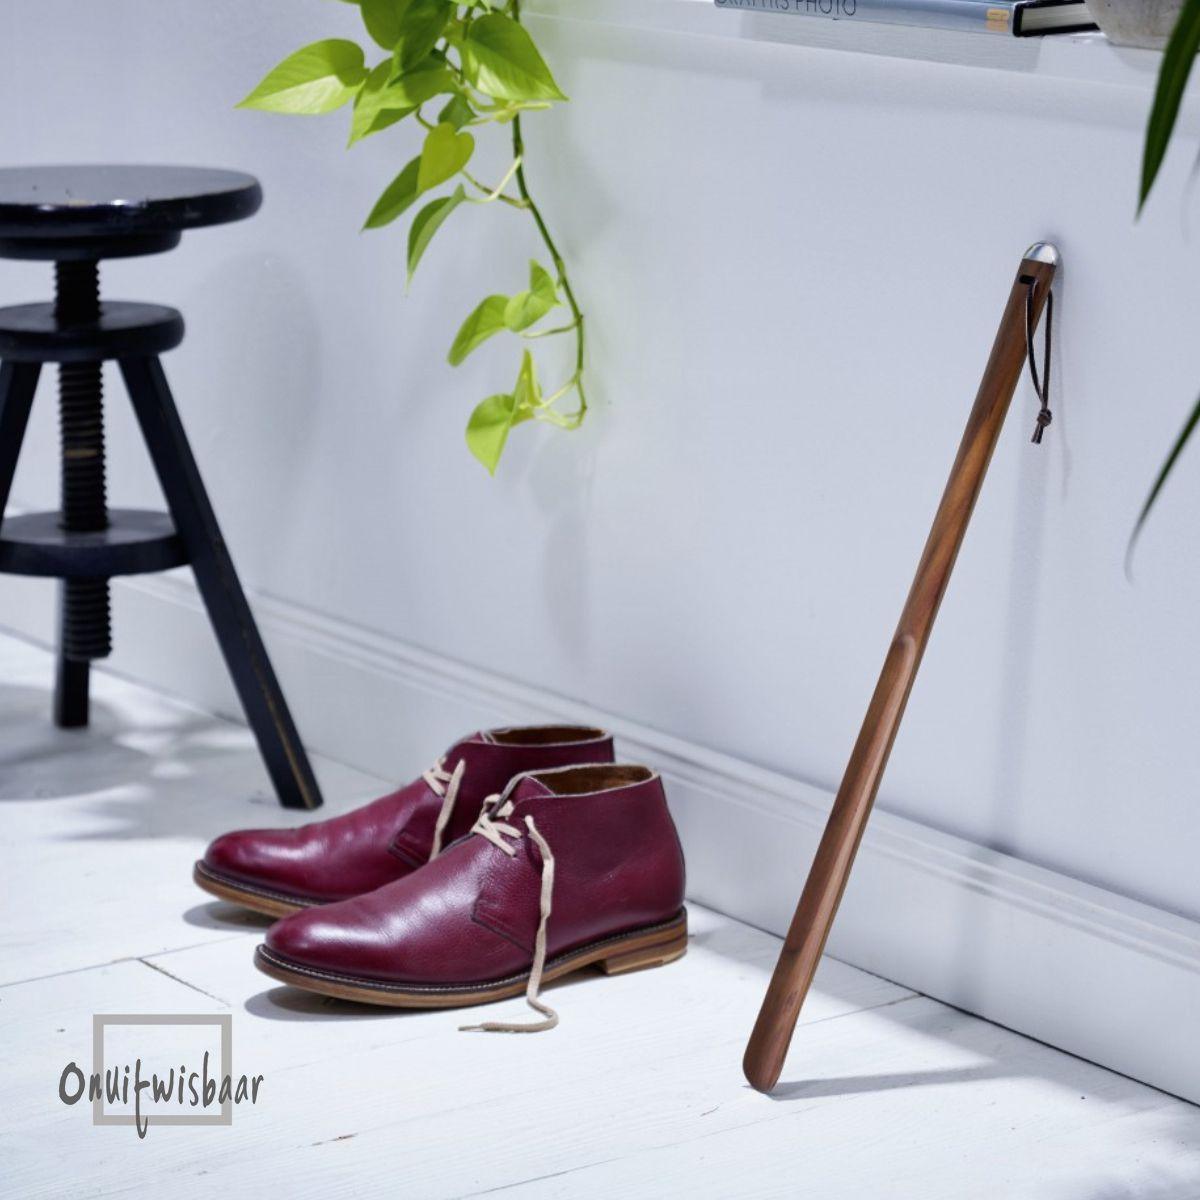 luxe schoenlepel